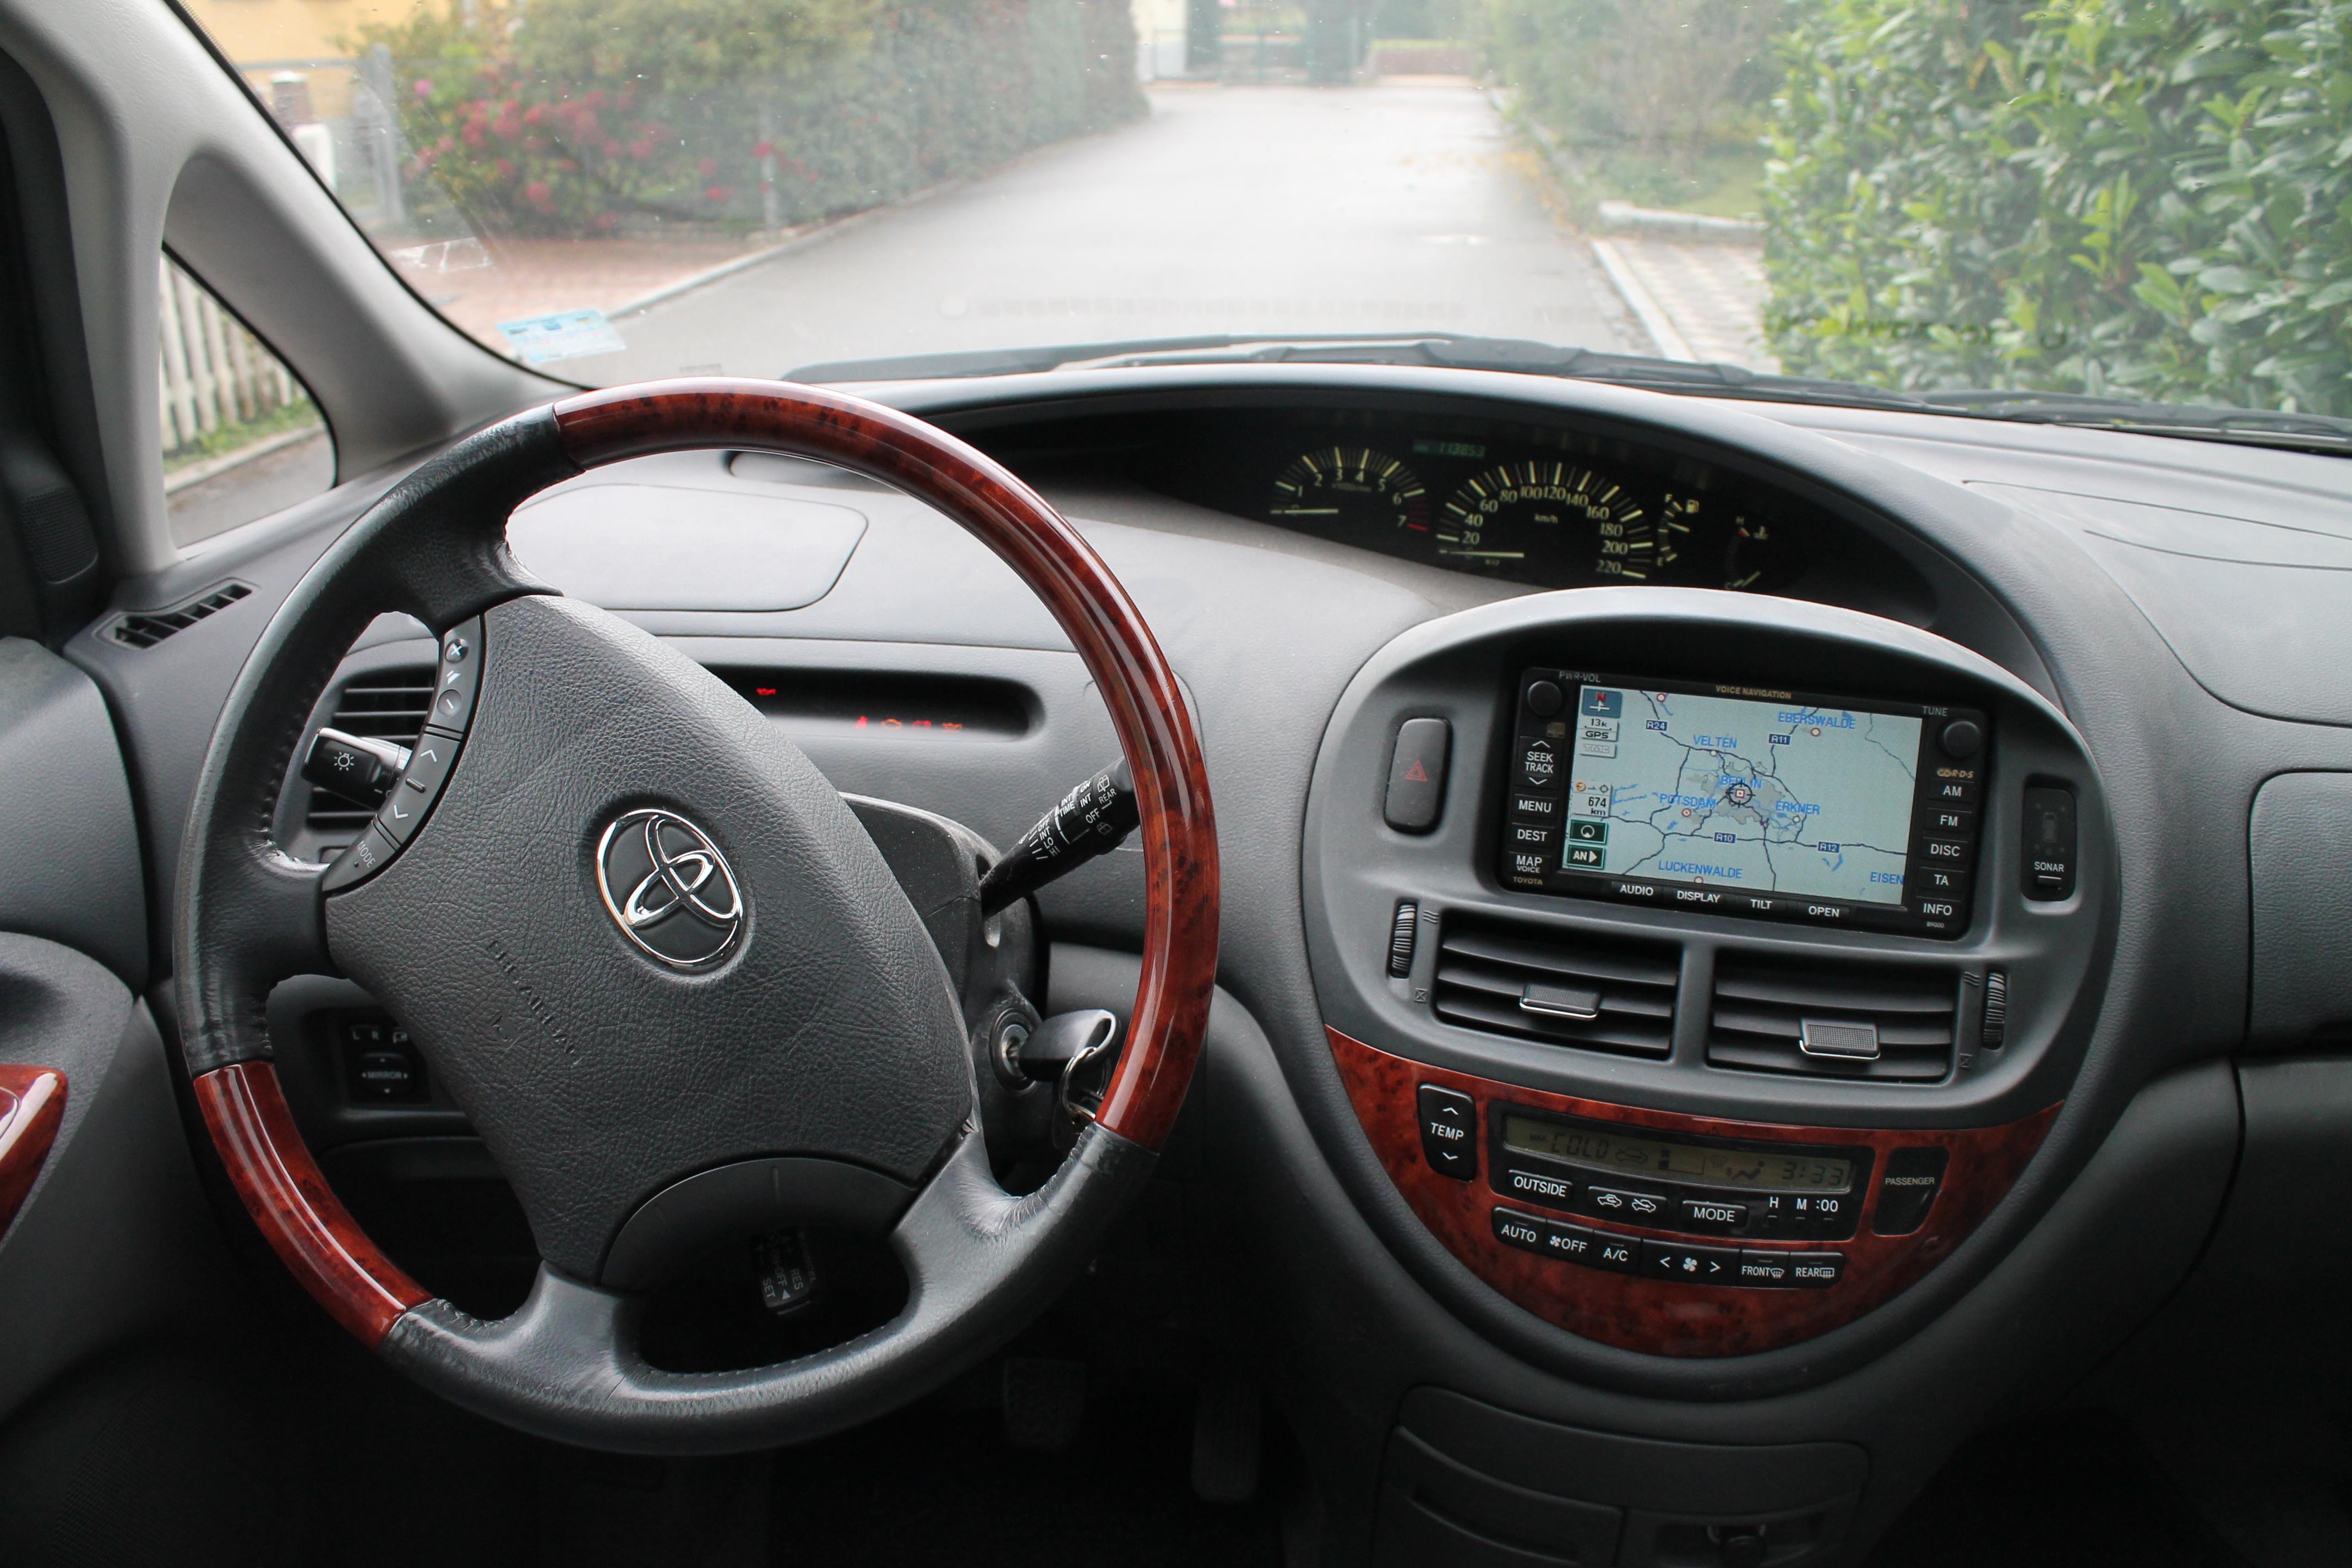 Datei:Toyota Previa 2nd generation Cockpit 2. – Wikipedia